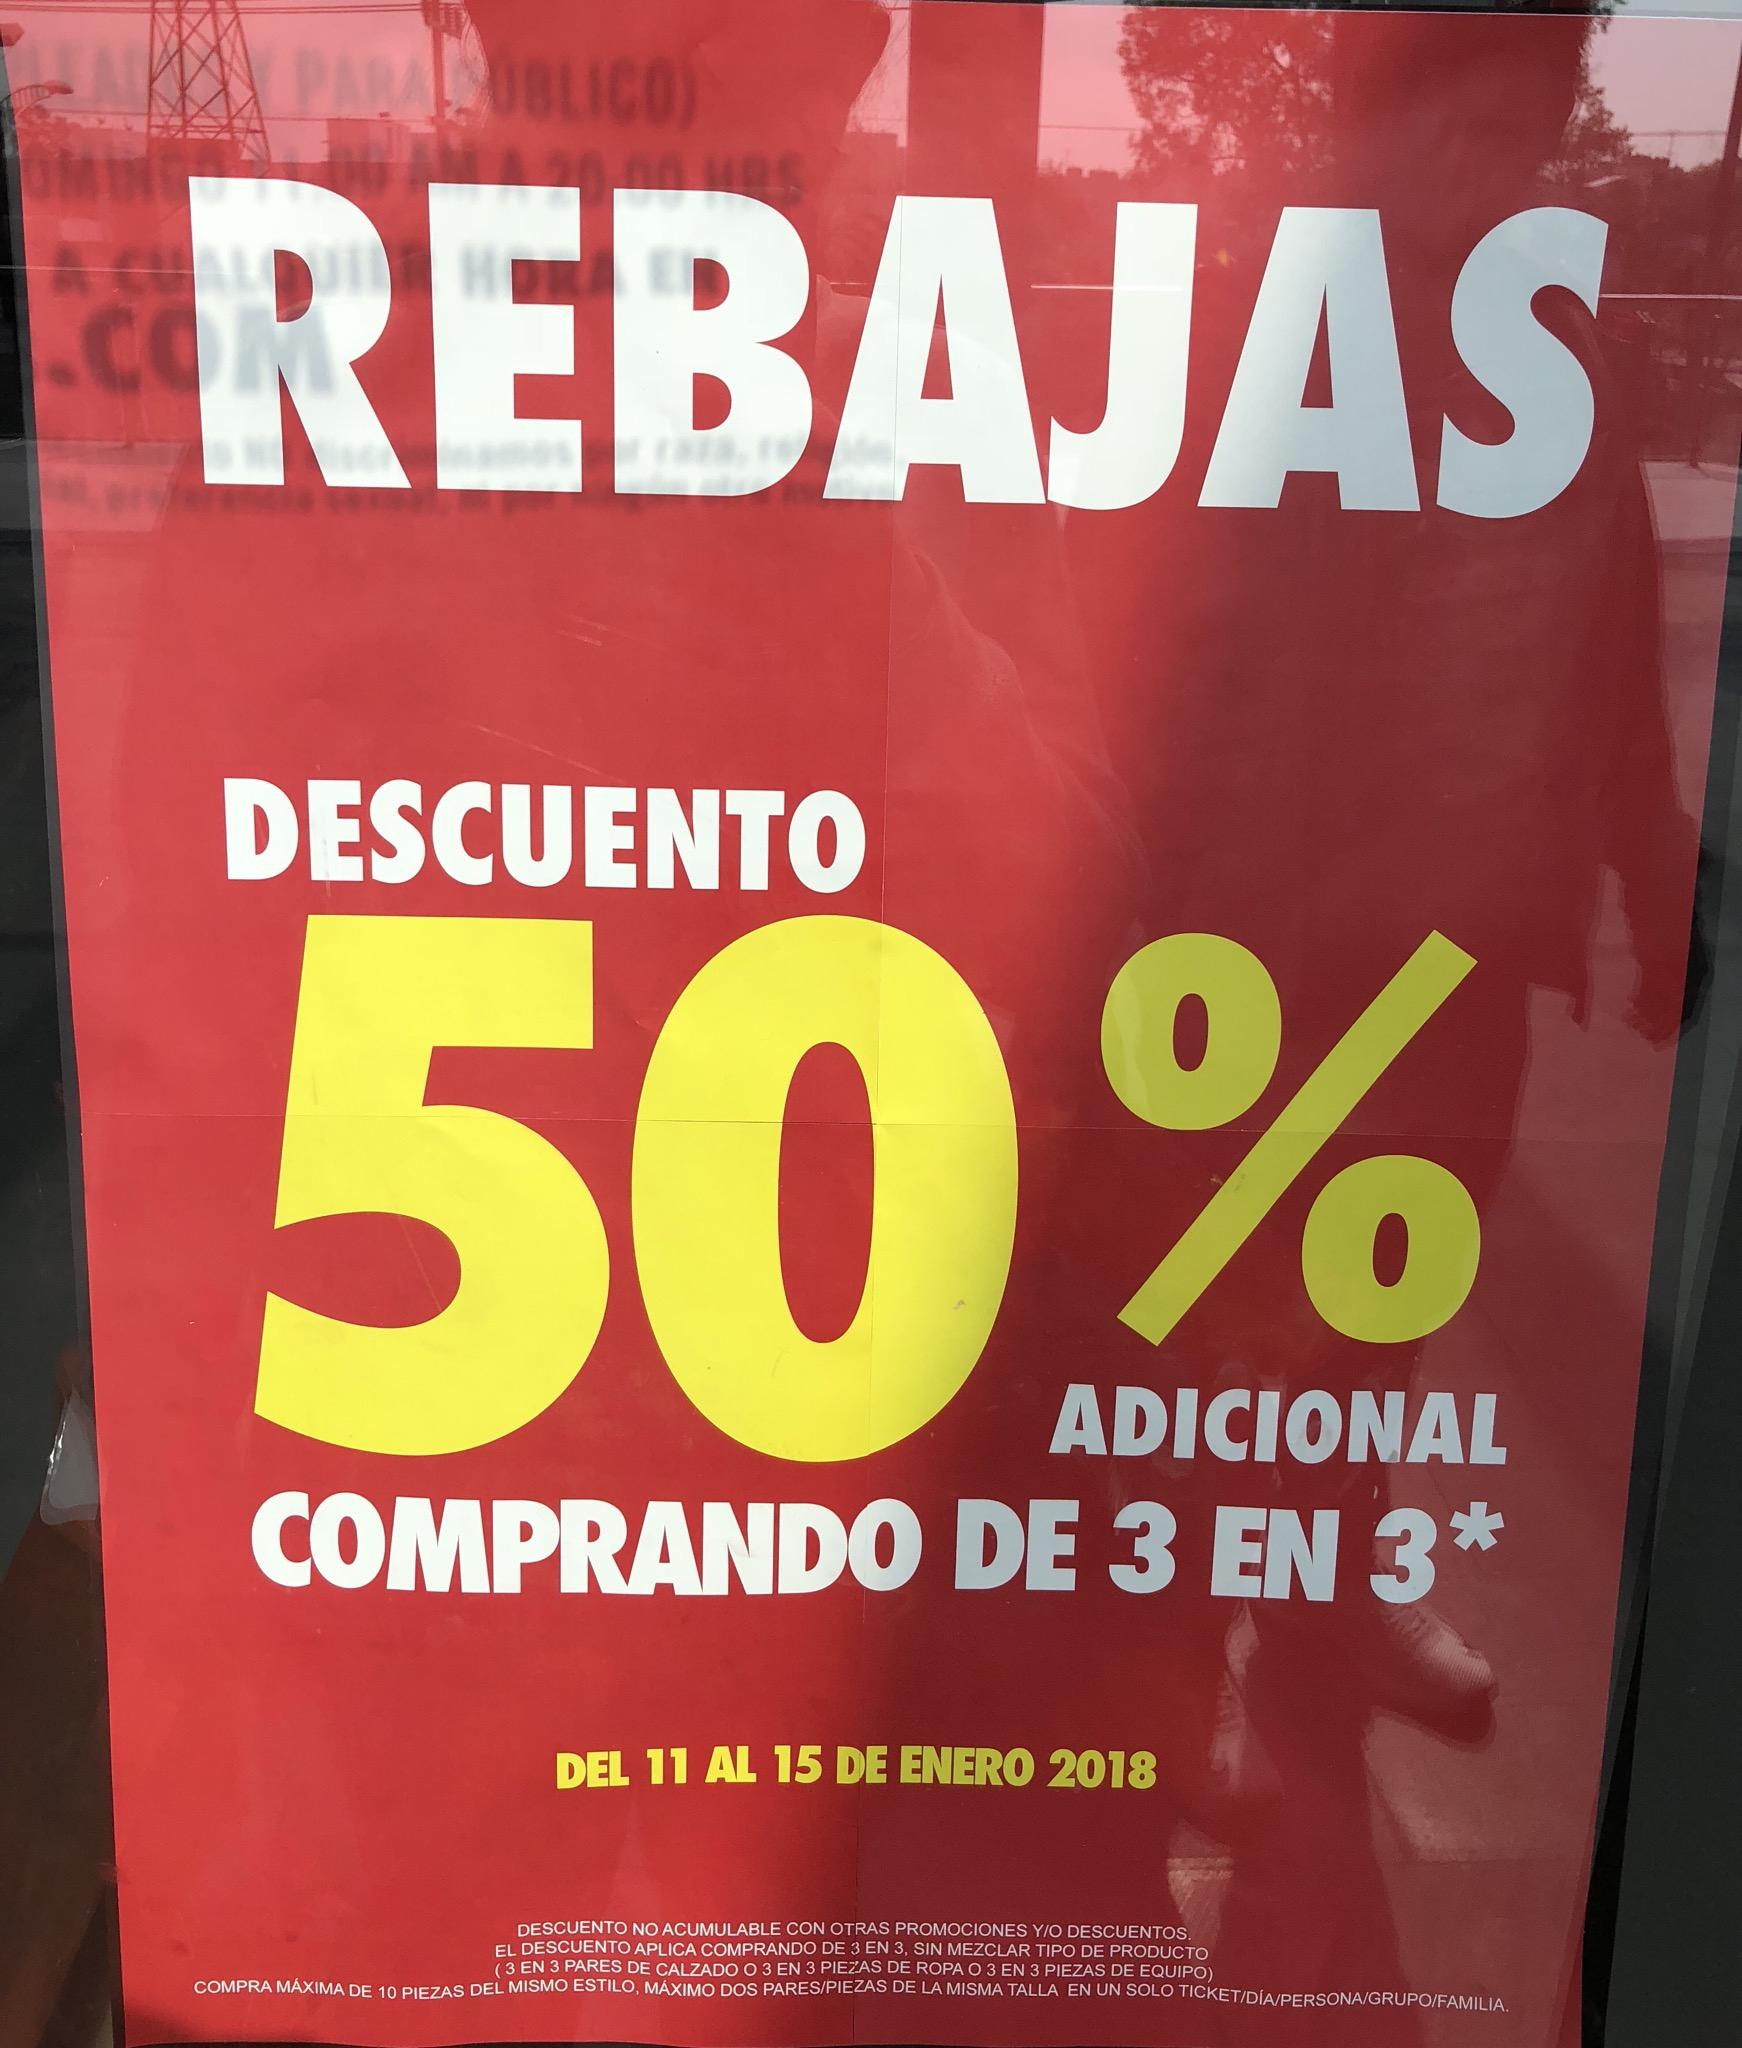 Nike Factory Store: 50% de descuento comprando 3